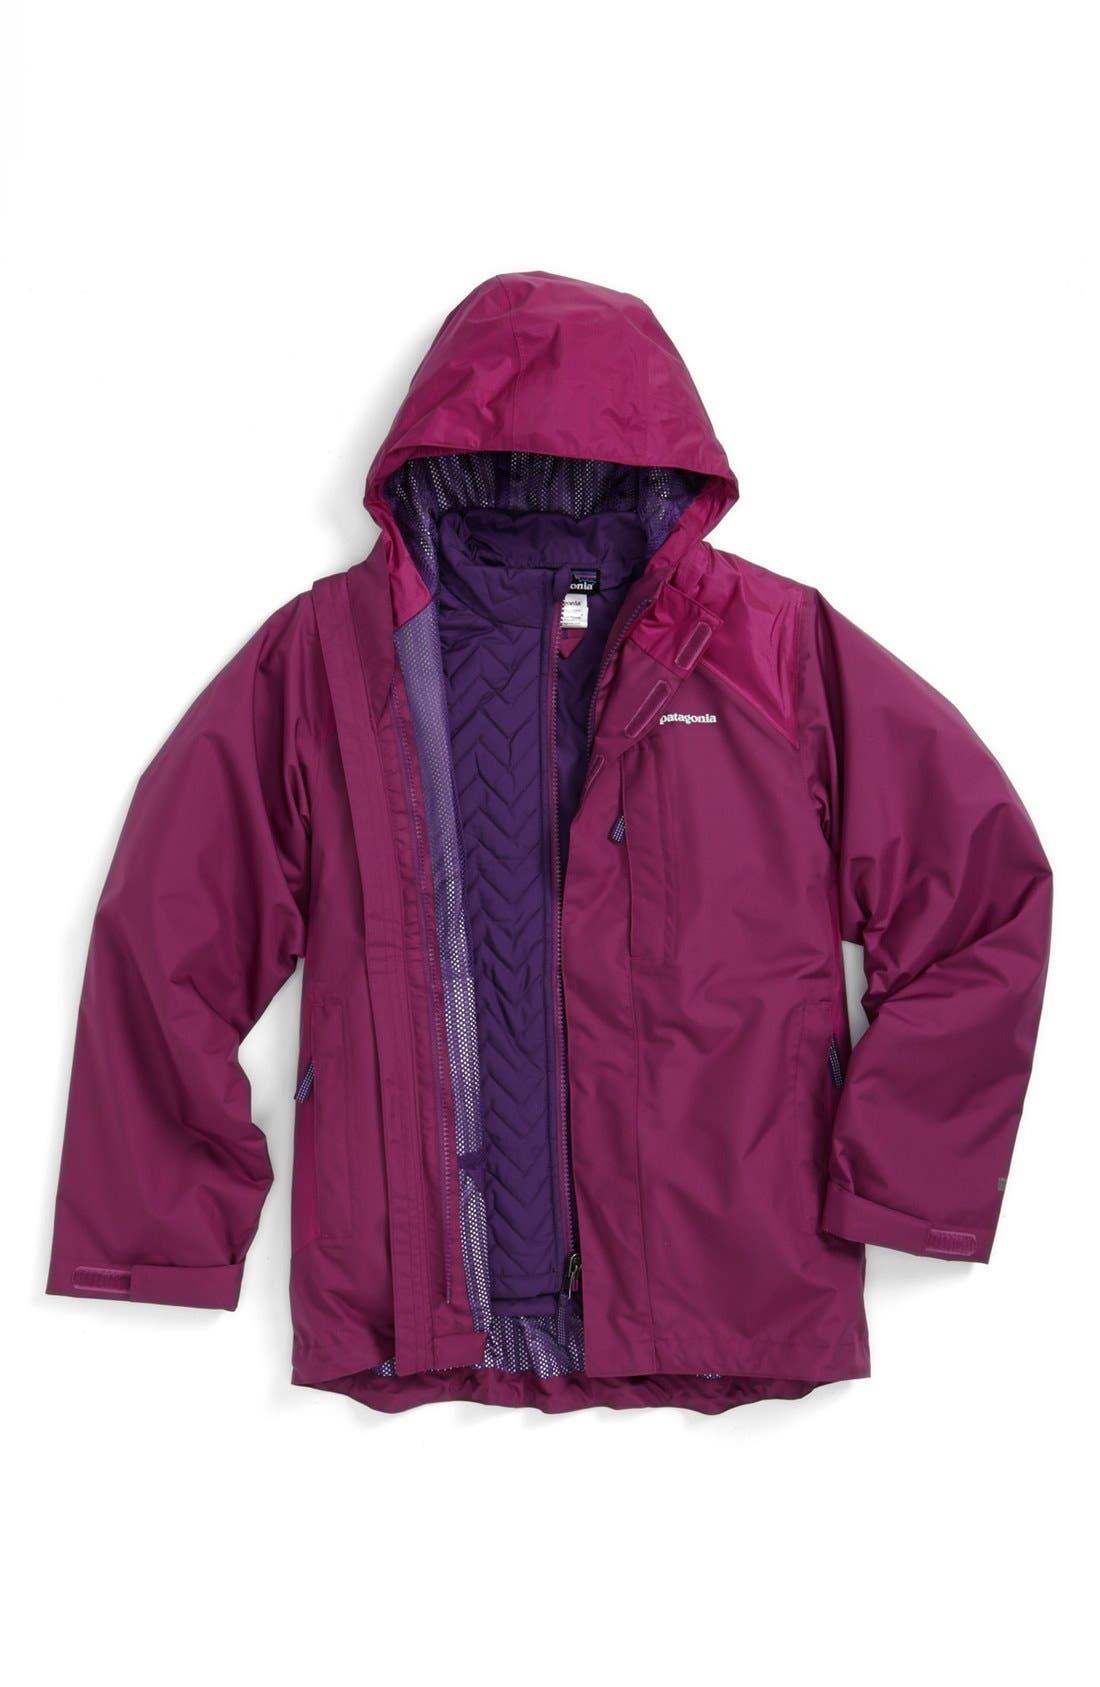 Main Image - Patagonia Waterproof 3-in-1 Snowsport Jacket (Little Girls & Big Girls)